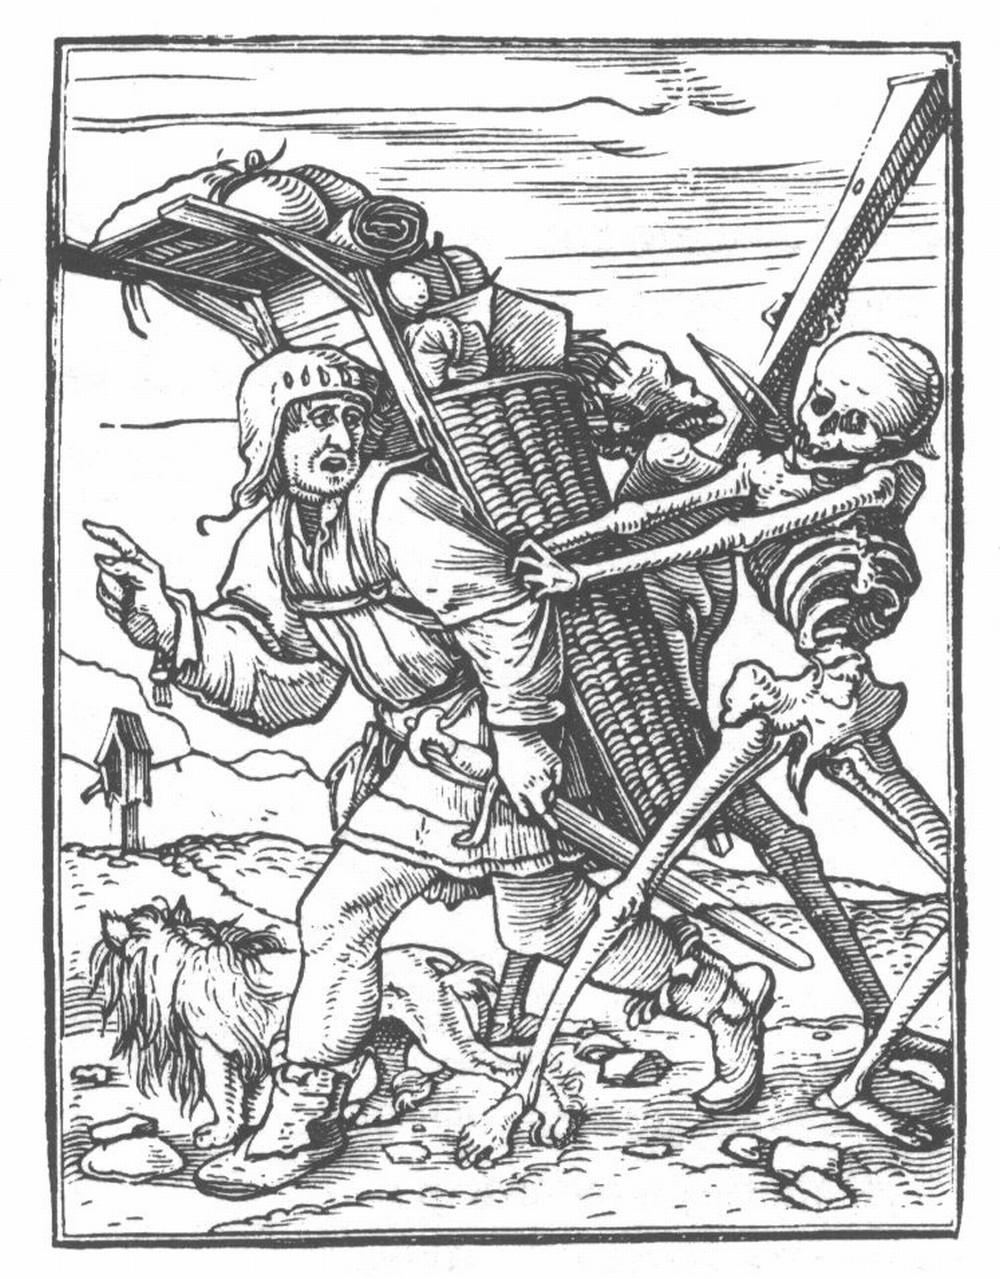 http://fr.academic.ru/pictures/frwiki/72/Holbein_Danse_Macabre_37.jpg